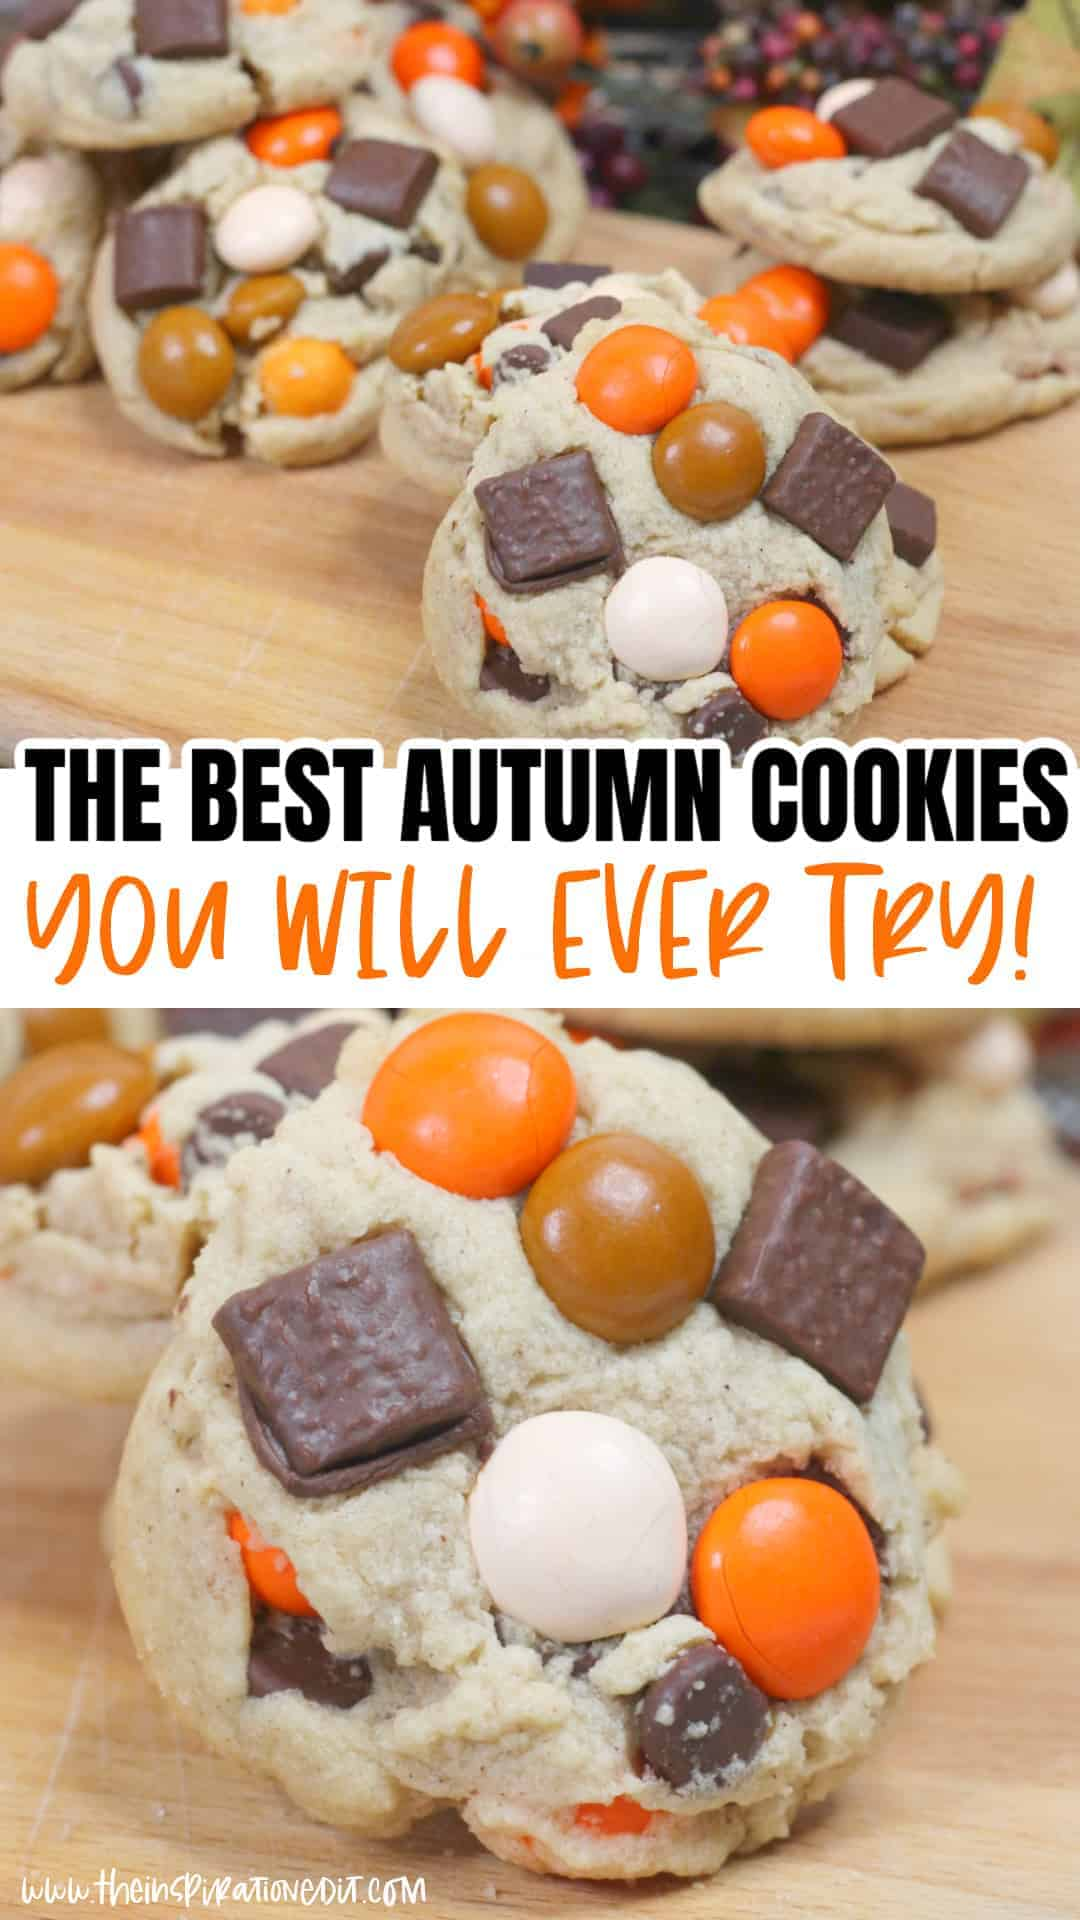 the-best-autumn-cookies-recipe-around